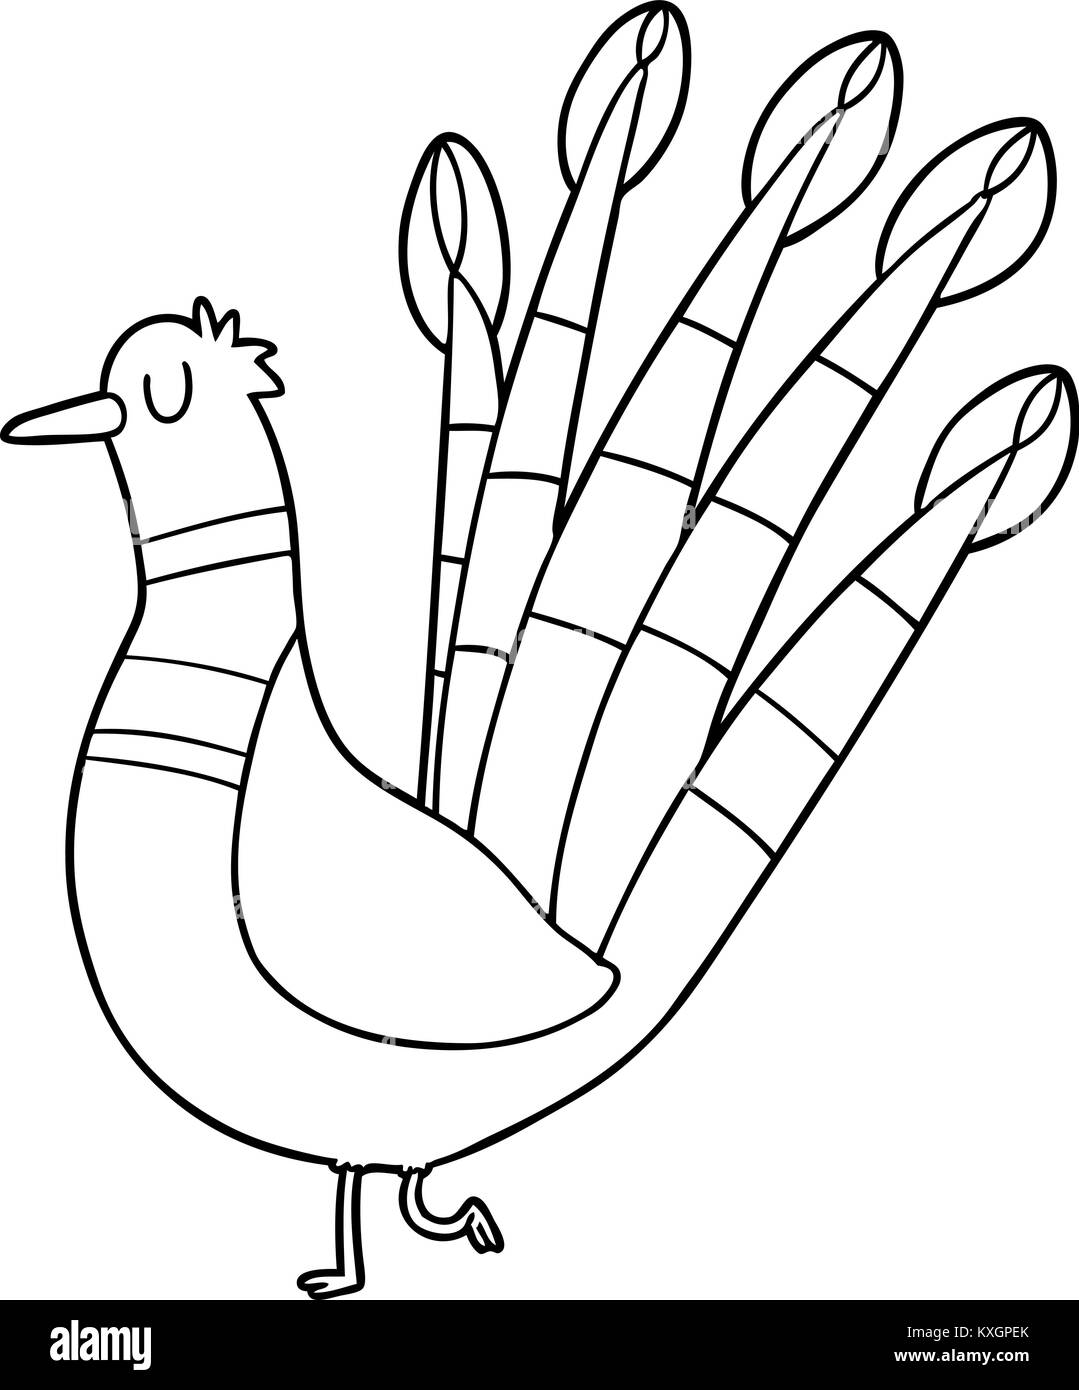 Get Peacock Cartoon Black And White